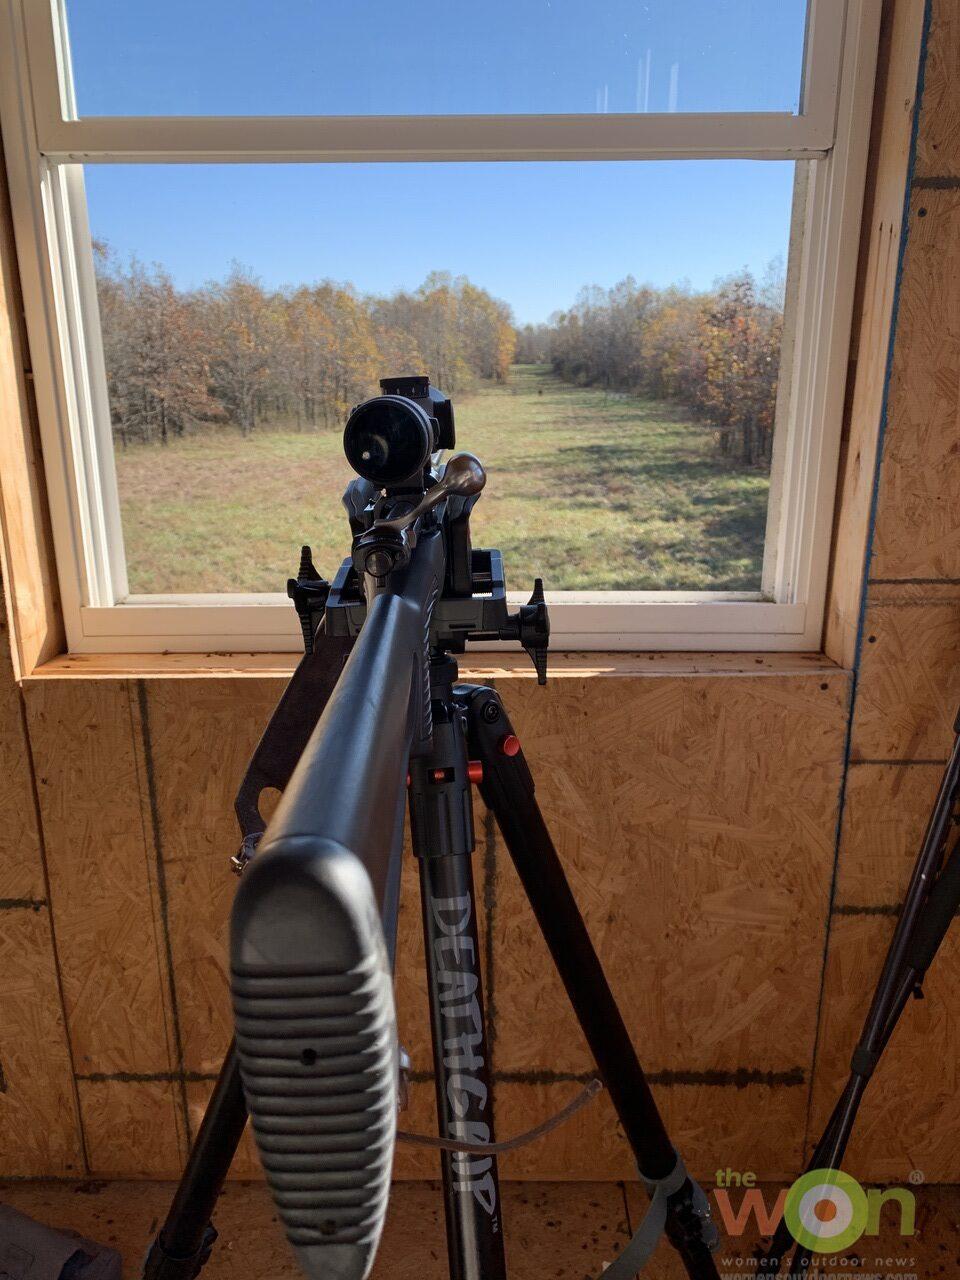 BOG DeathGrip tripod and blind window